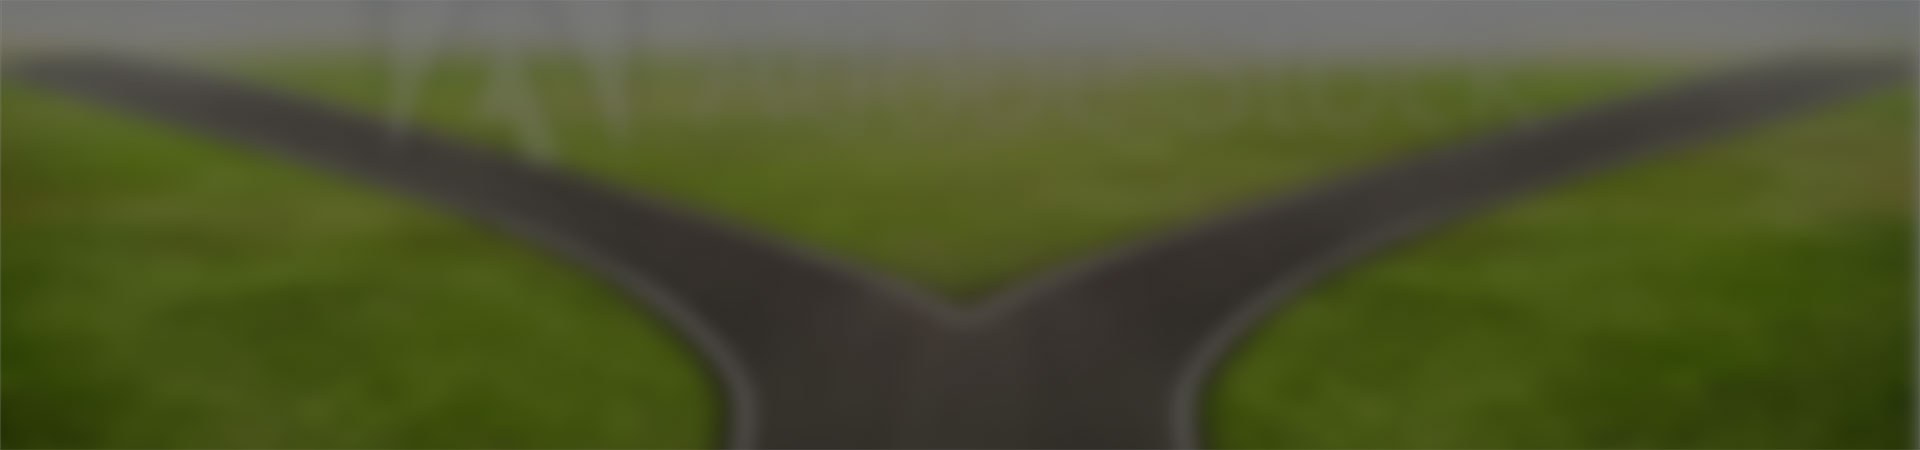 https://www.nexusglobal.com/sites/default/files/revslider/image/Background-image-low.jpg